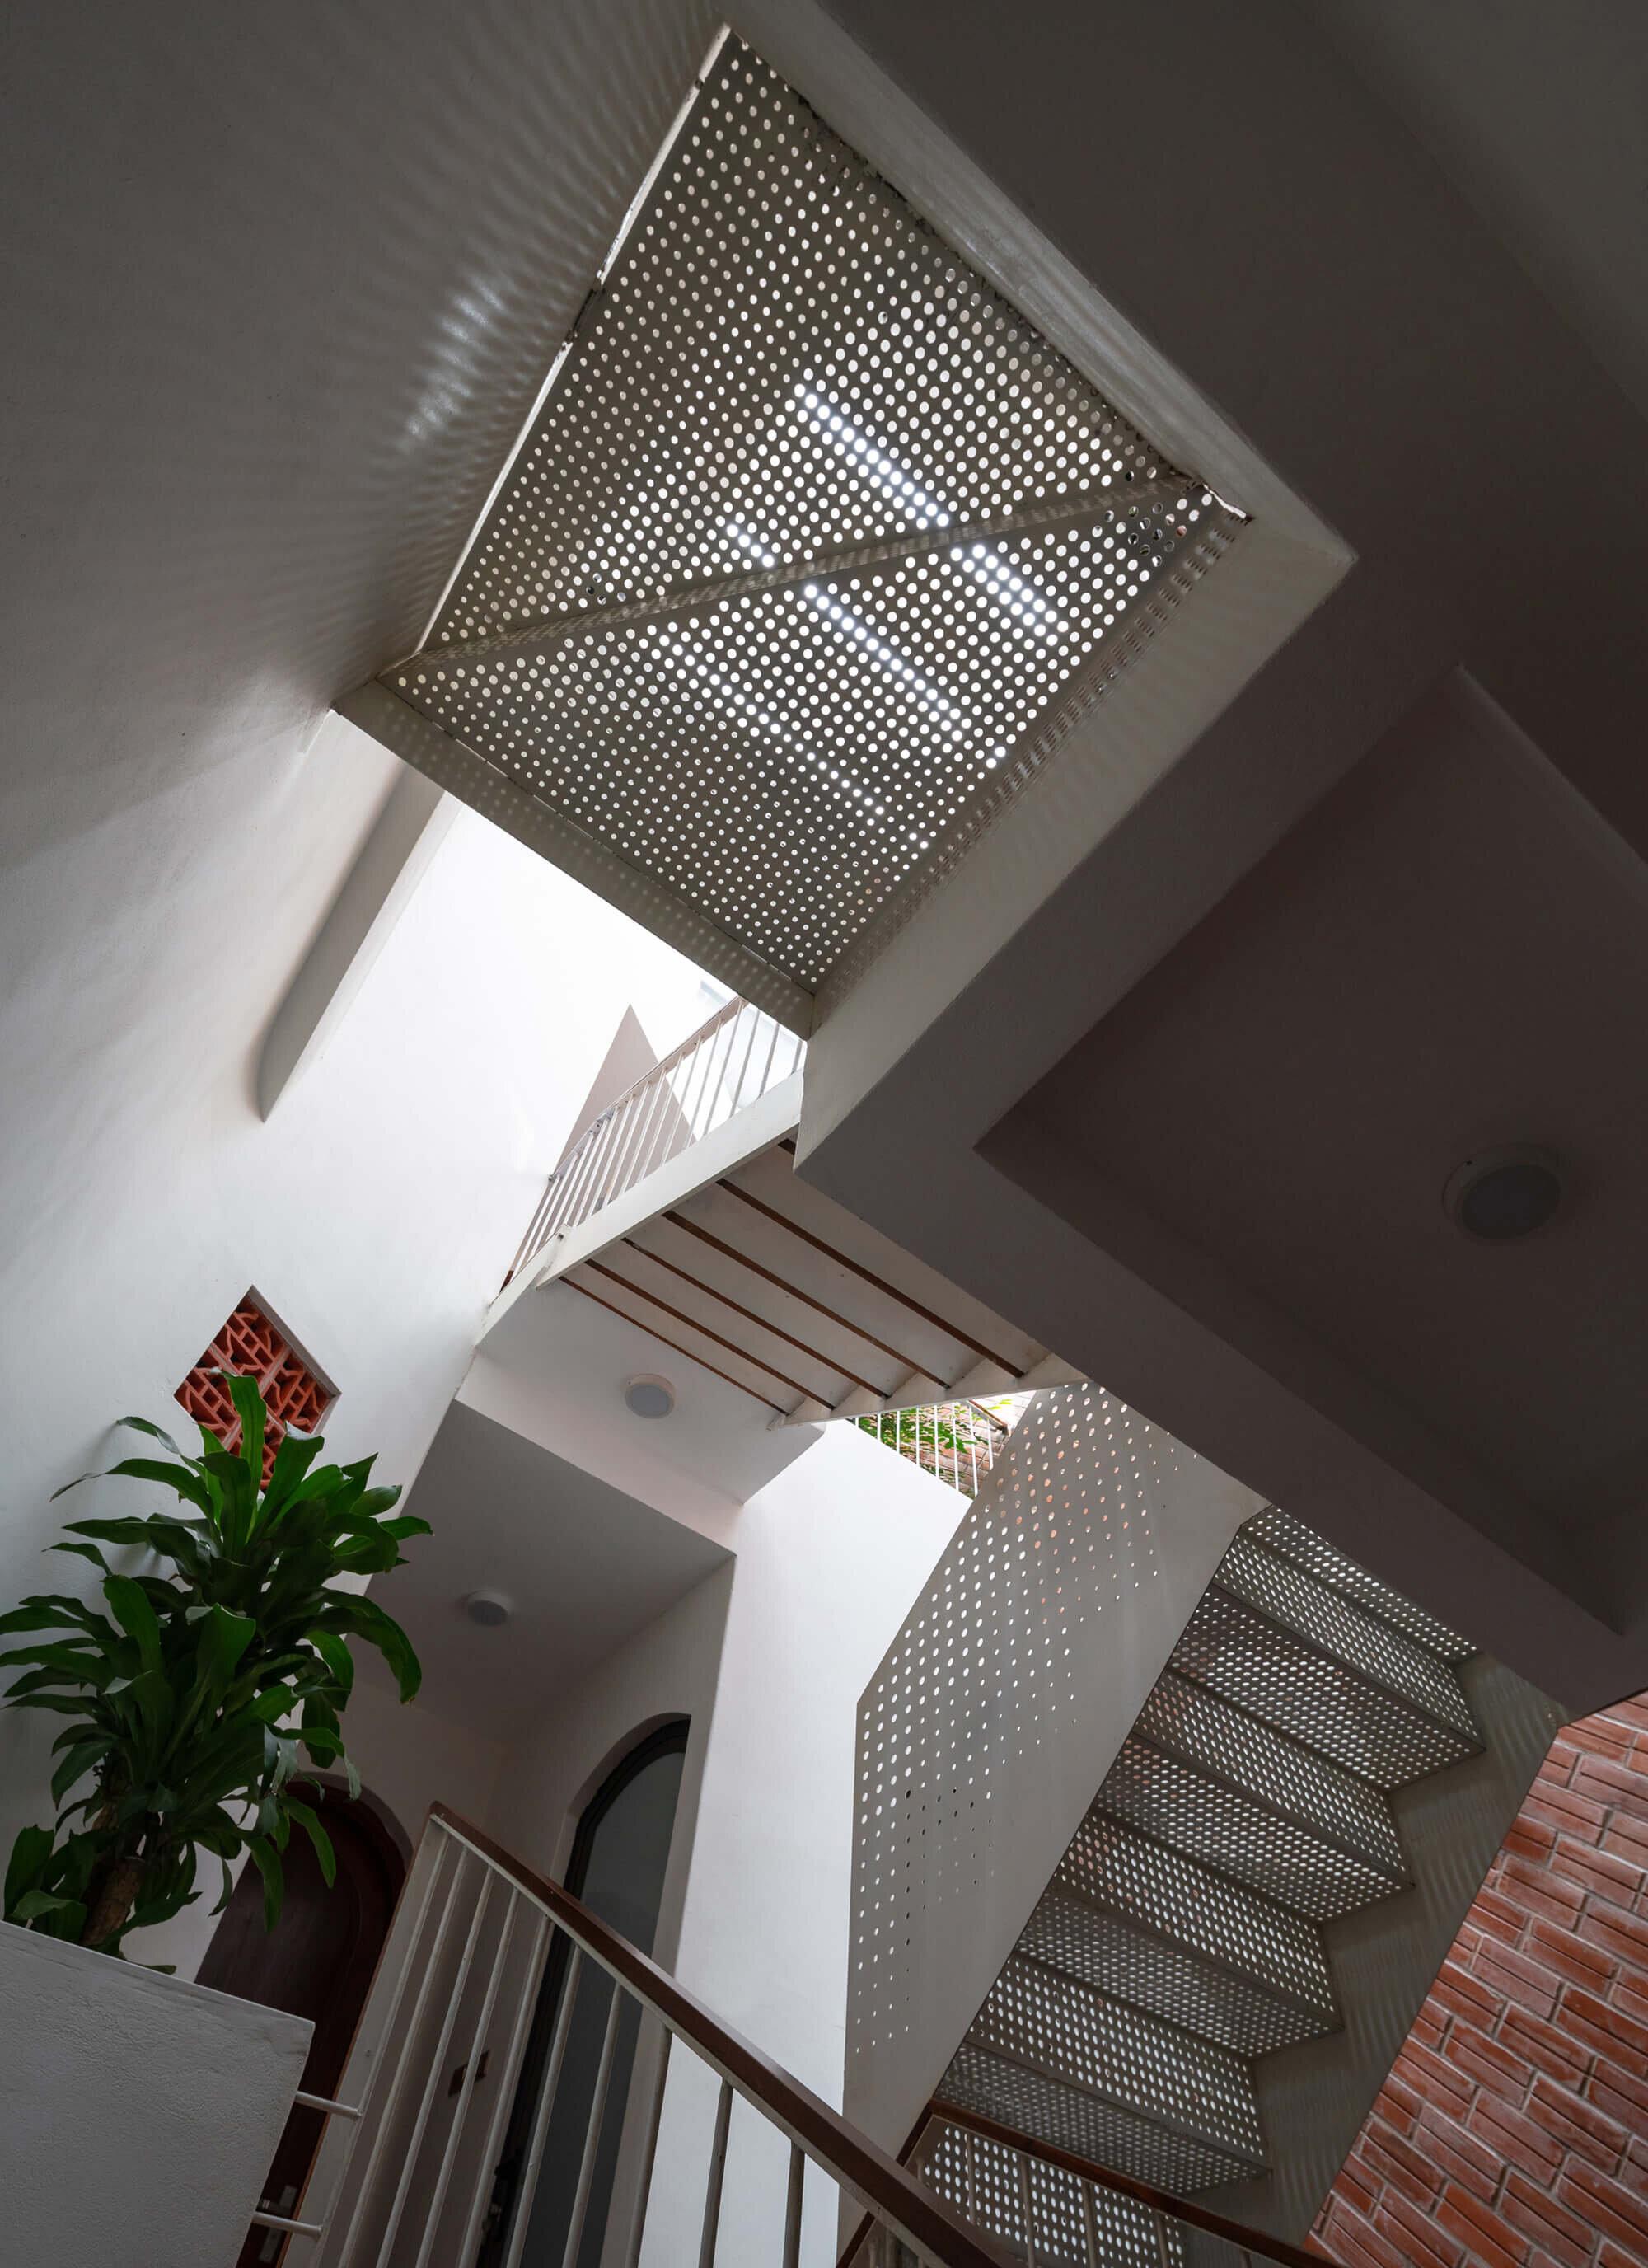 Đại-Kim-house-Aline-Architect-Vietnam-9